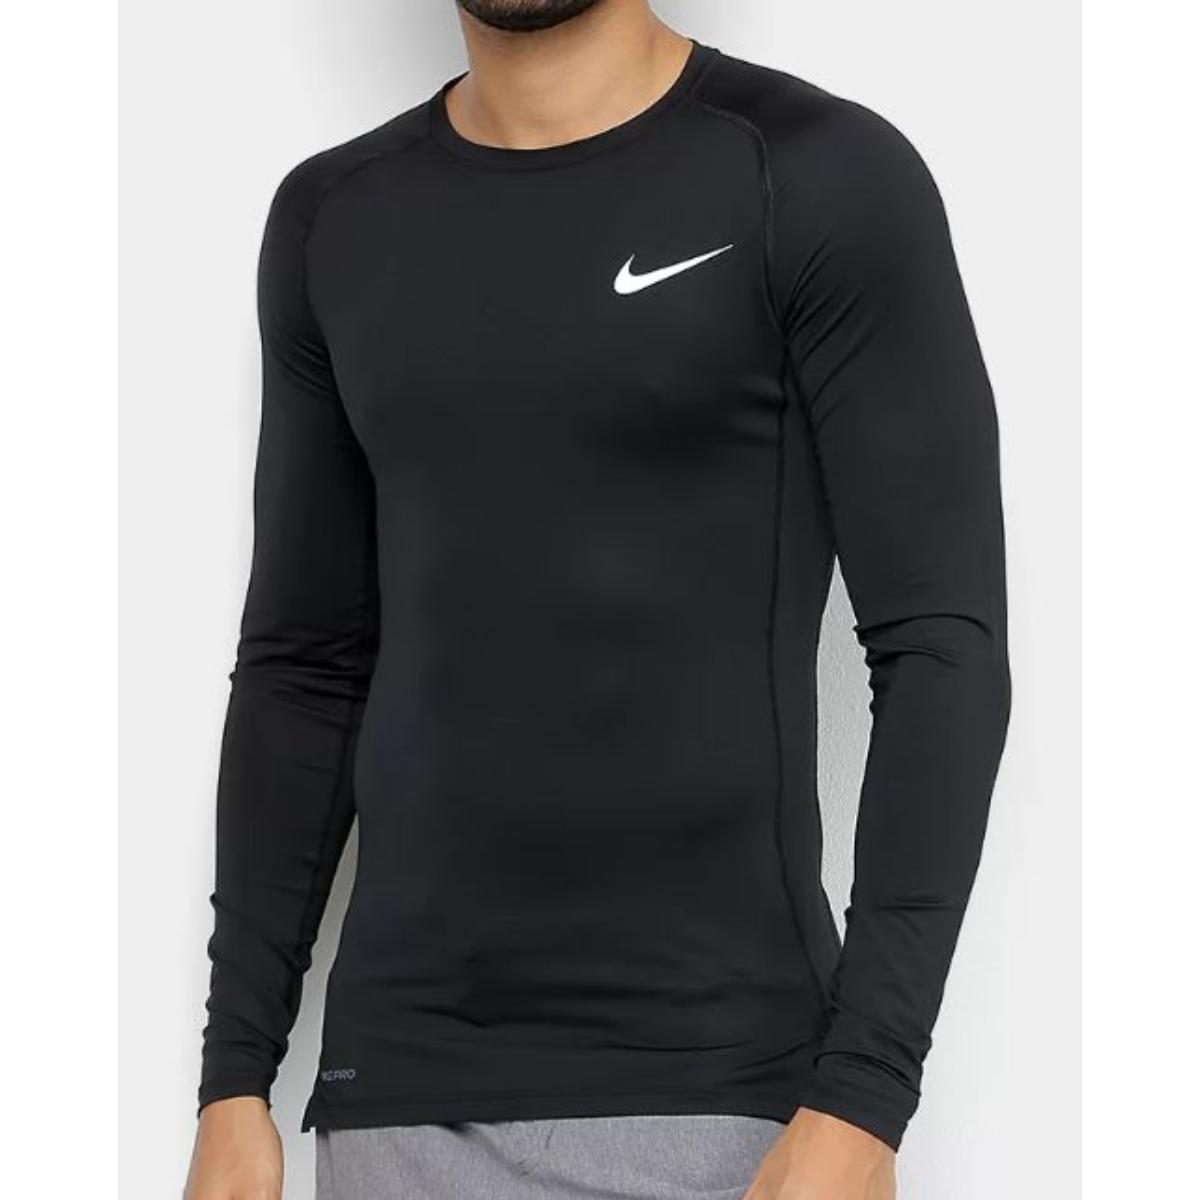 Camiseta Masculina Nike Bv5588-010 Pro Preto